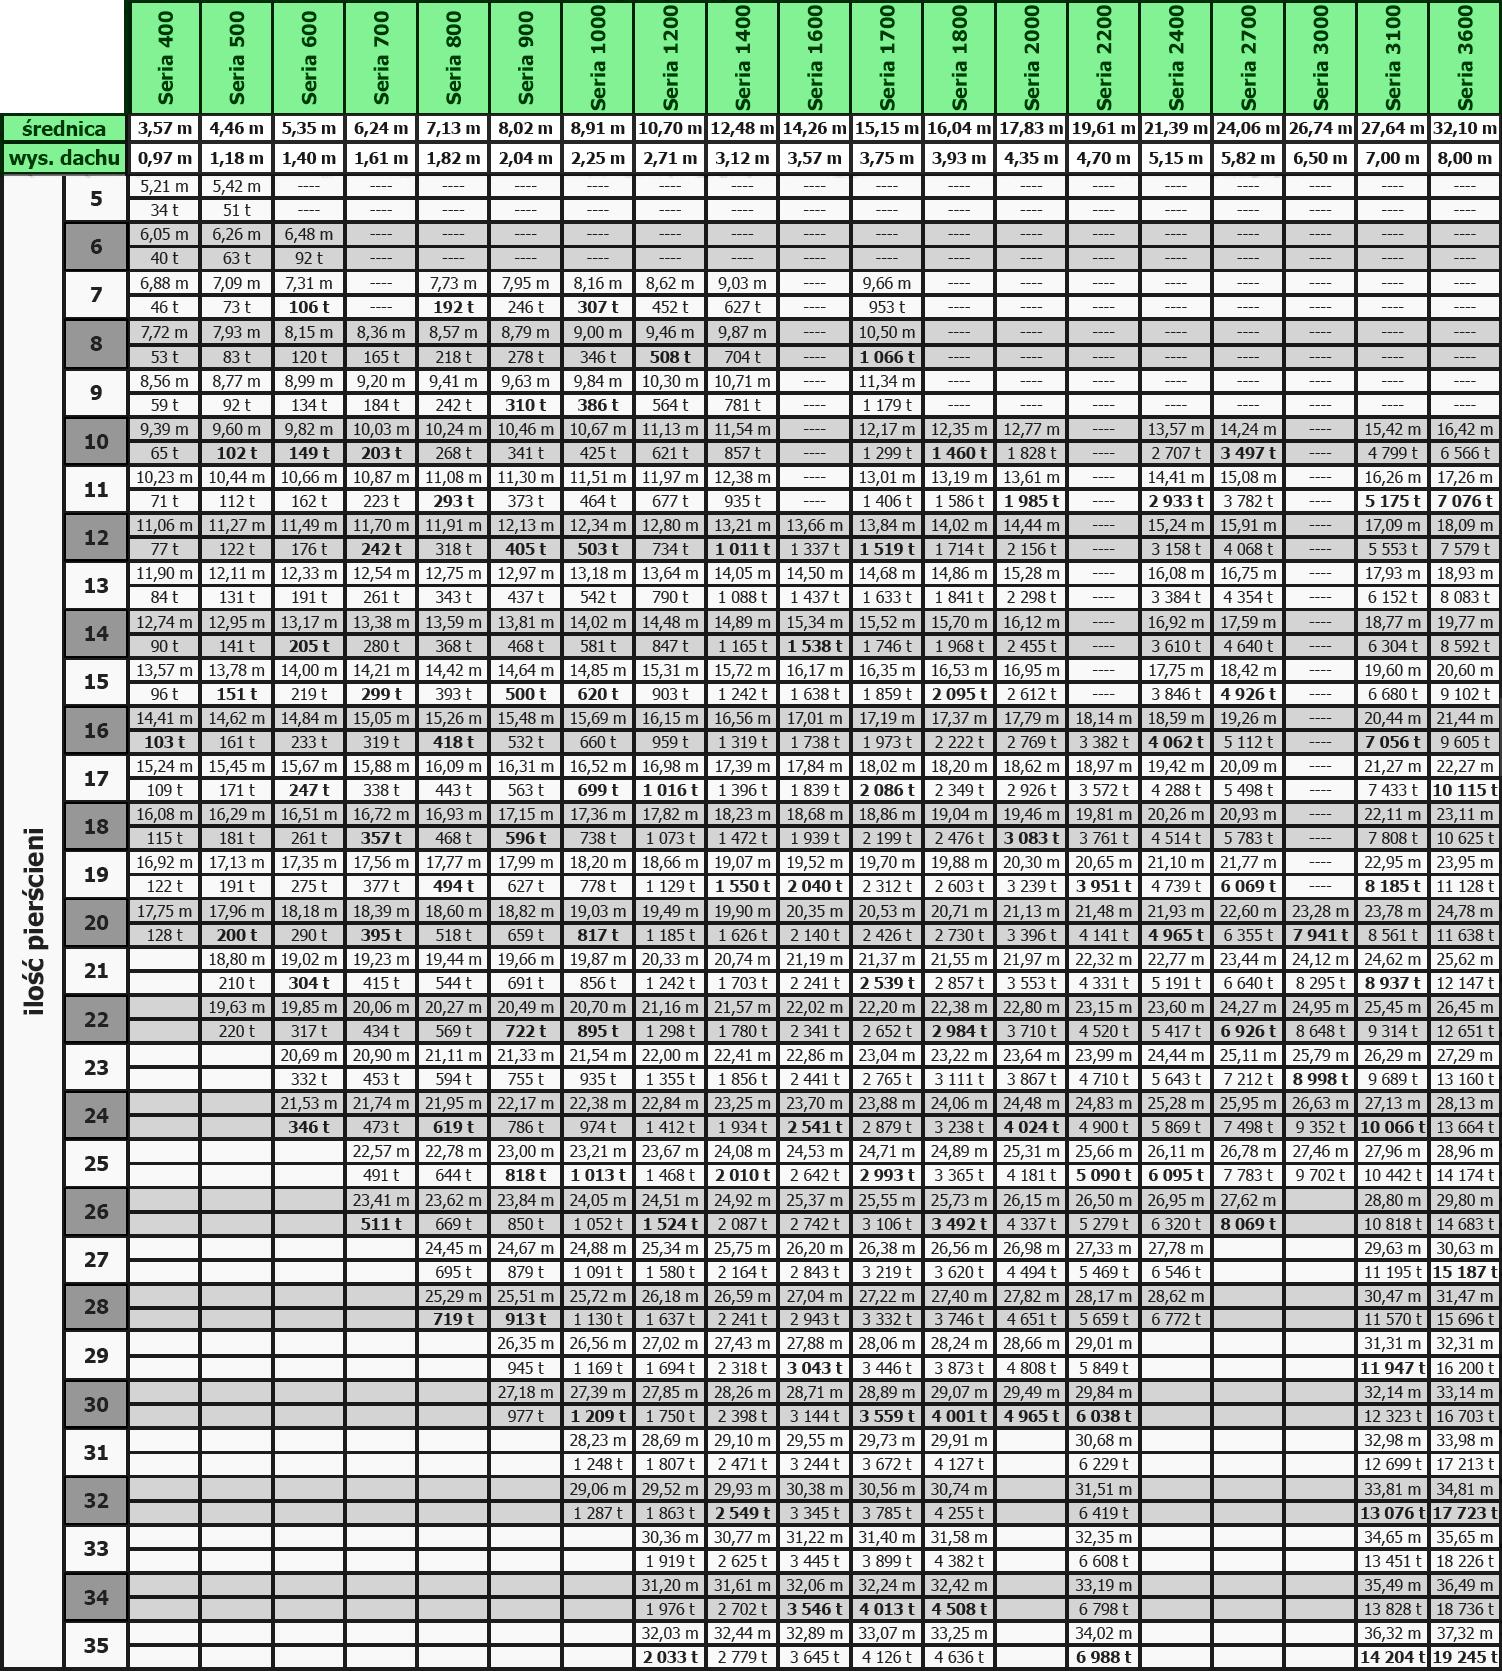 silosy-plaskie-tabela